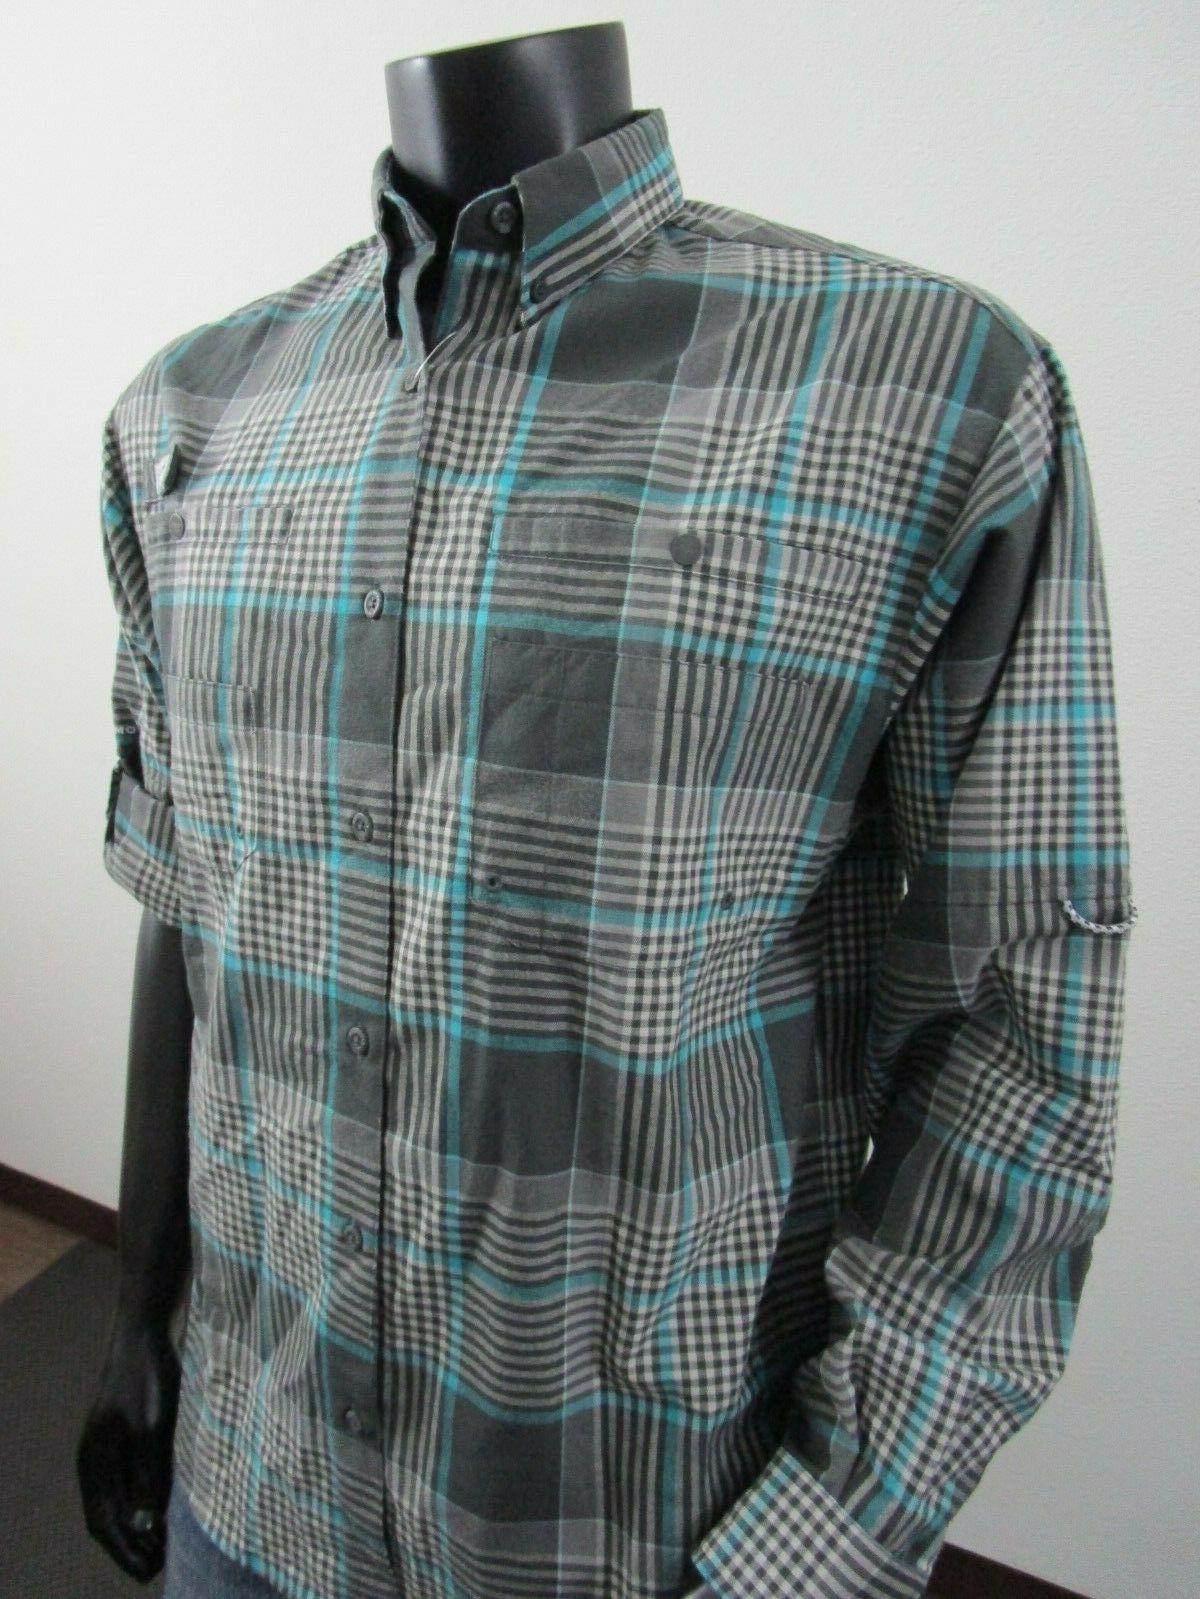 NWT M Columbia PFG Sleeve Shirt Grill